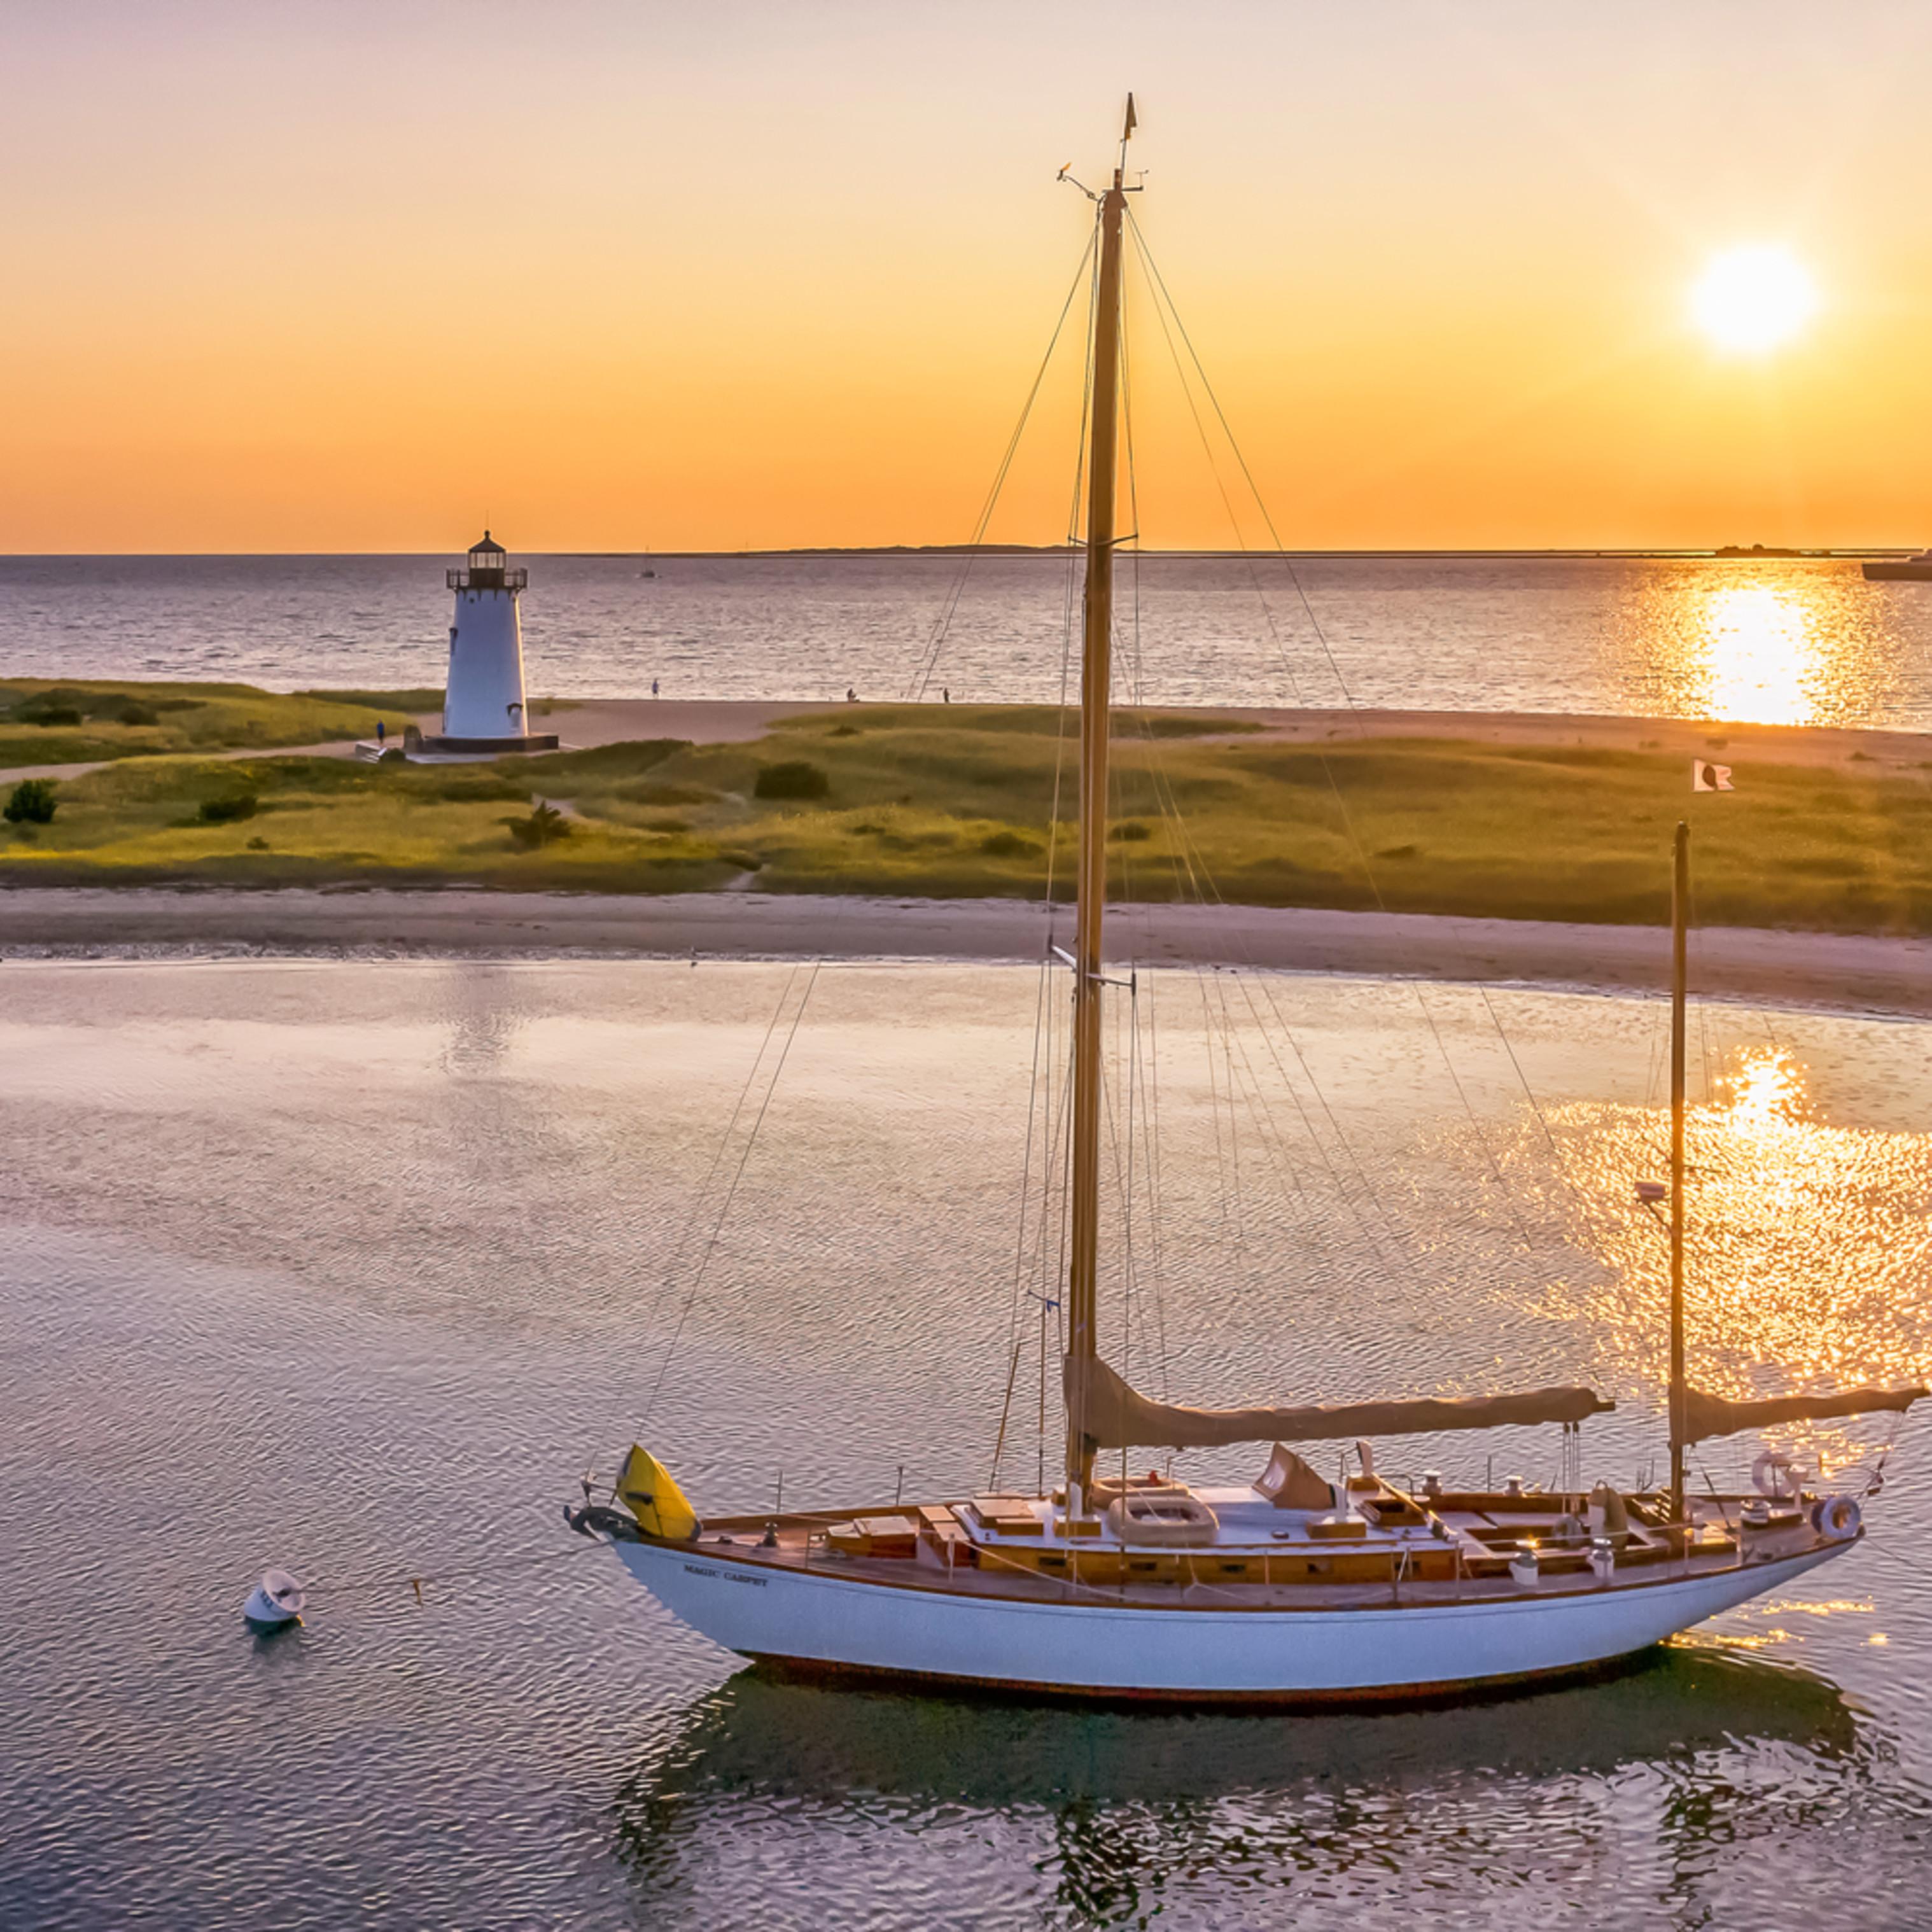 Edartown harbor summer sunrise dkkqlp